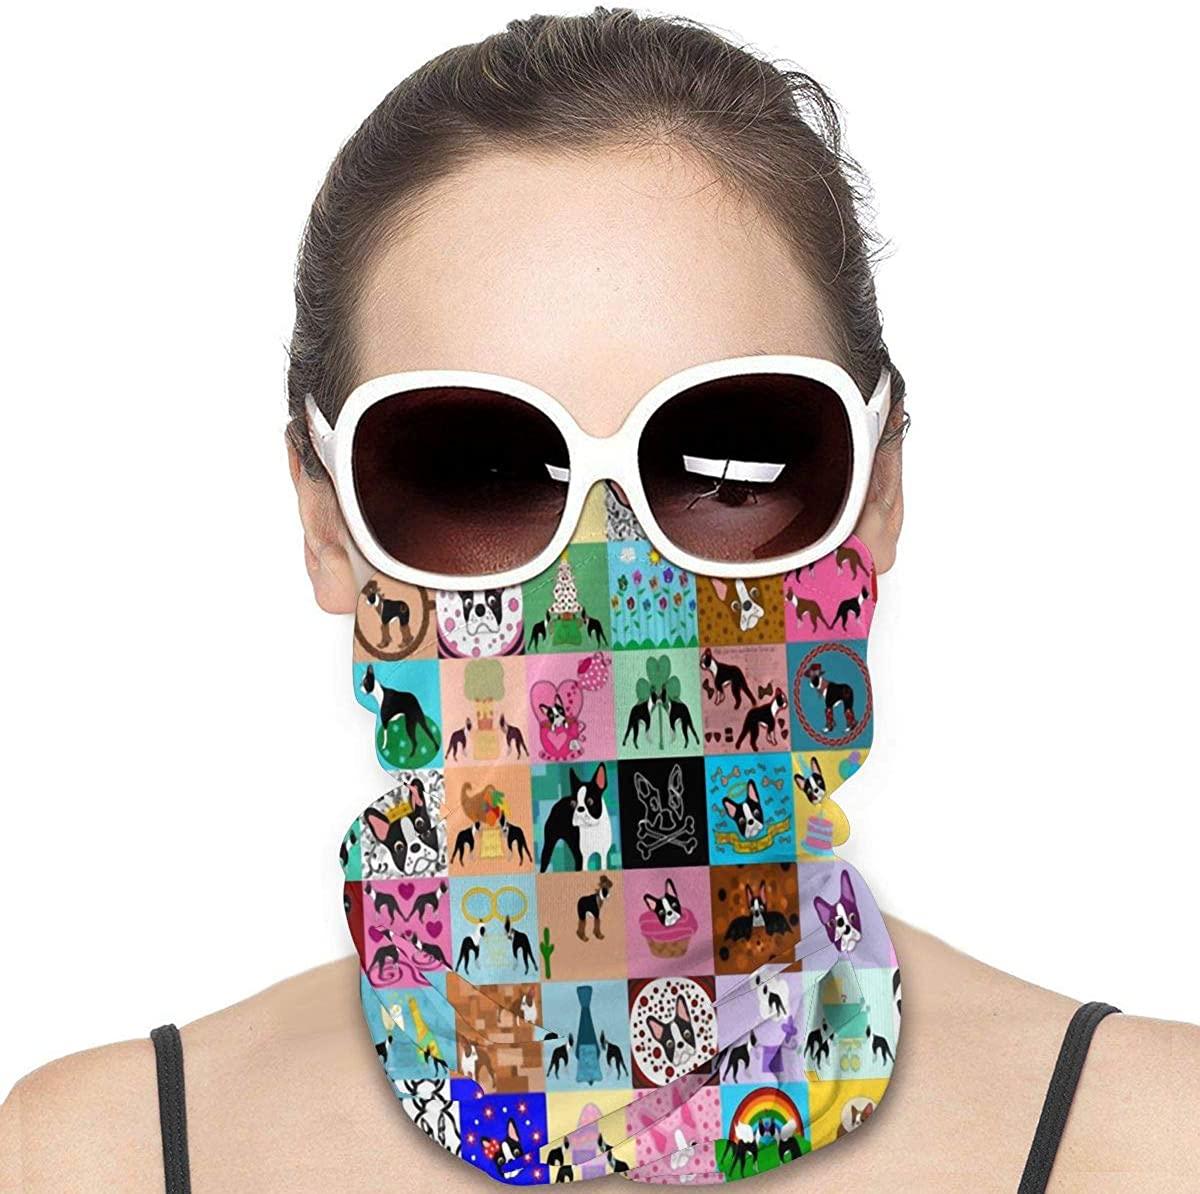 Crazy Faux Boston Terrier Neck Gaiter Summer Cool Breathable Lightweight Sun Uv Protection Face Bandana Half Mask Scarf Headwear Headband Balaclava Black